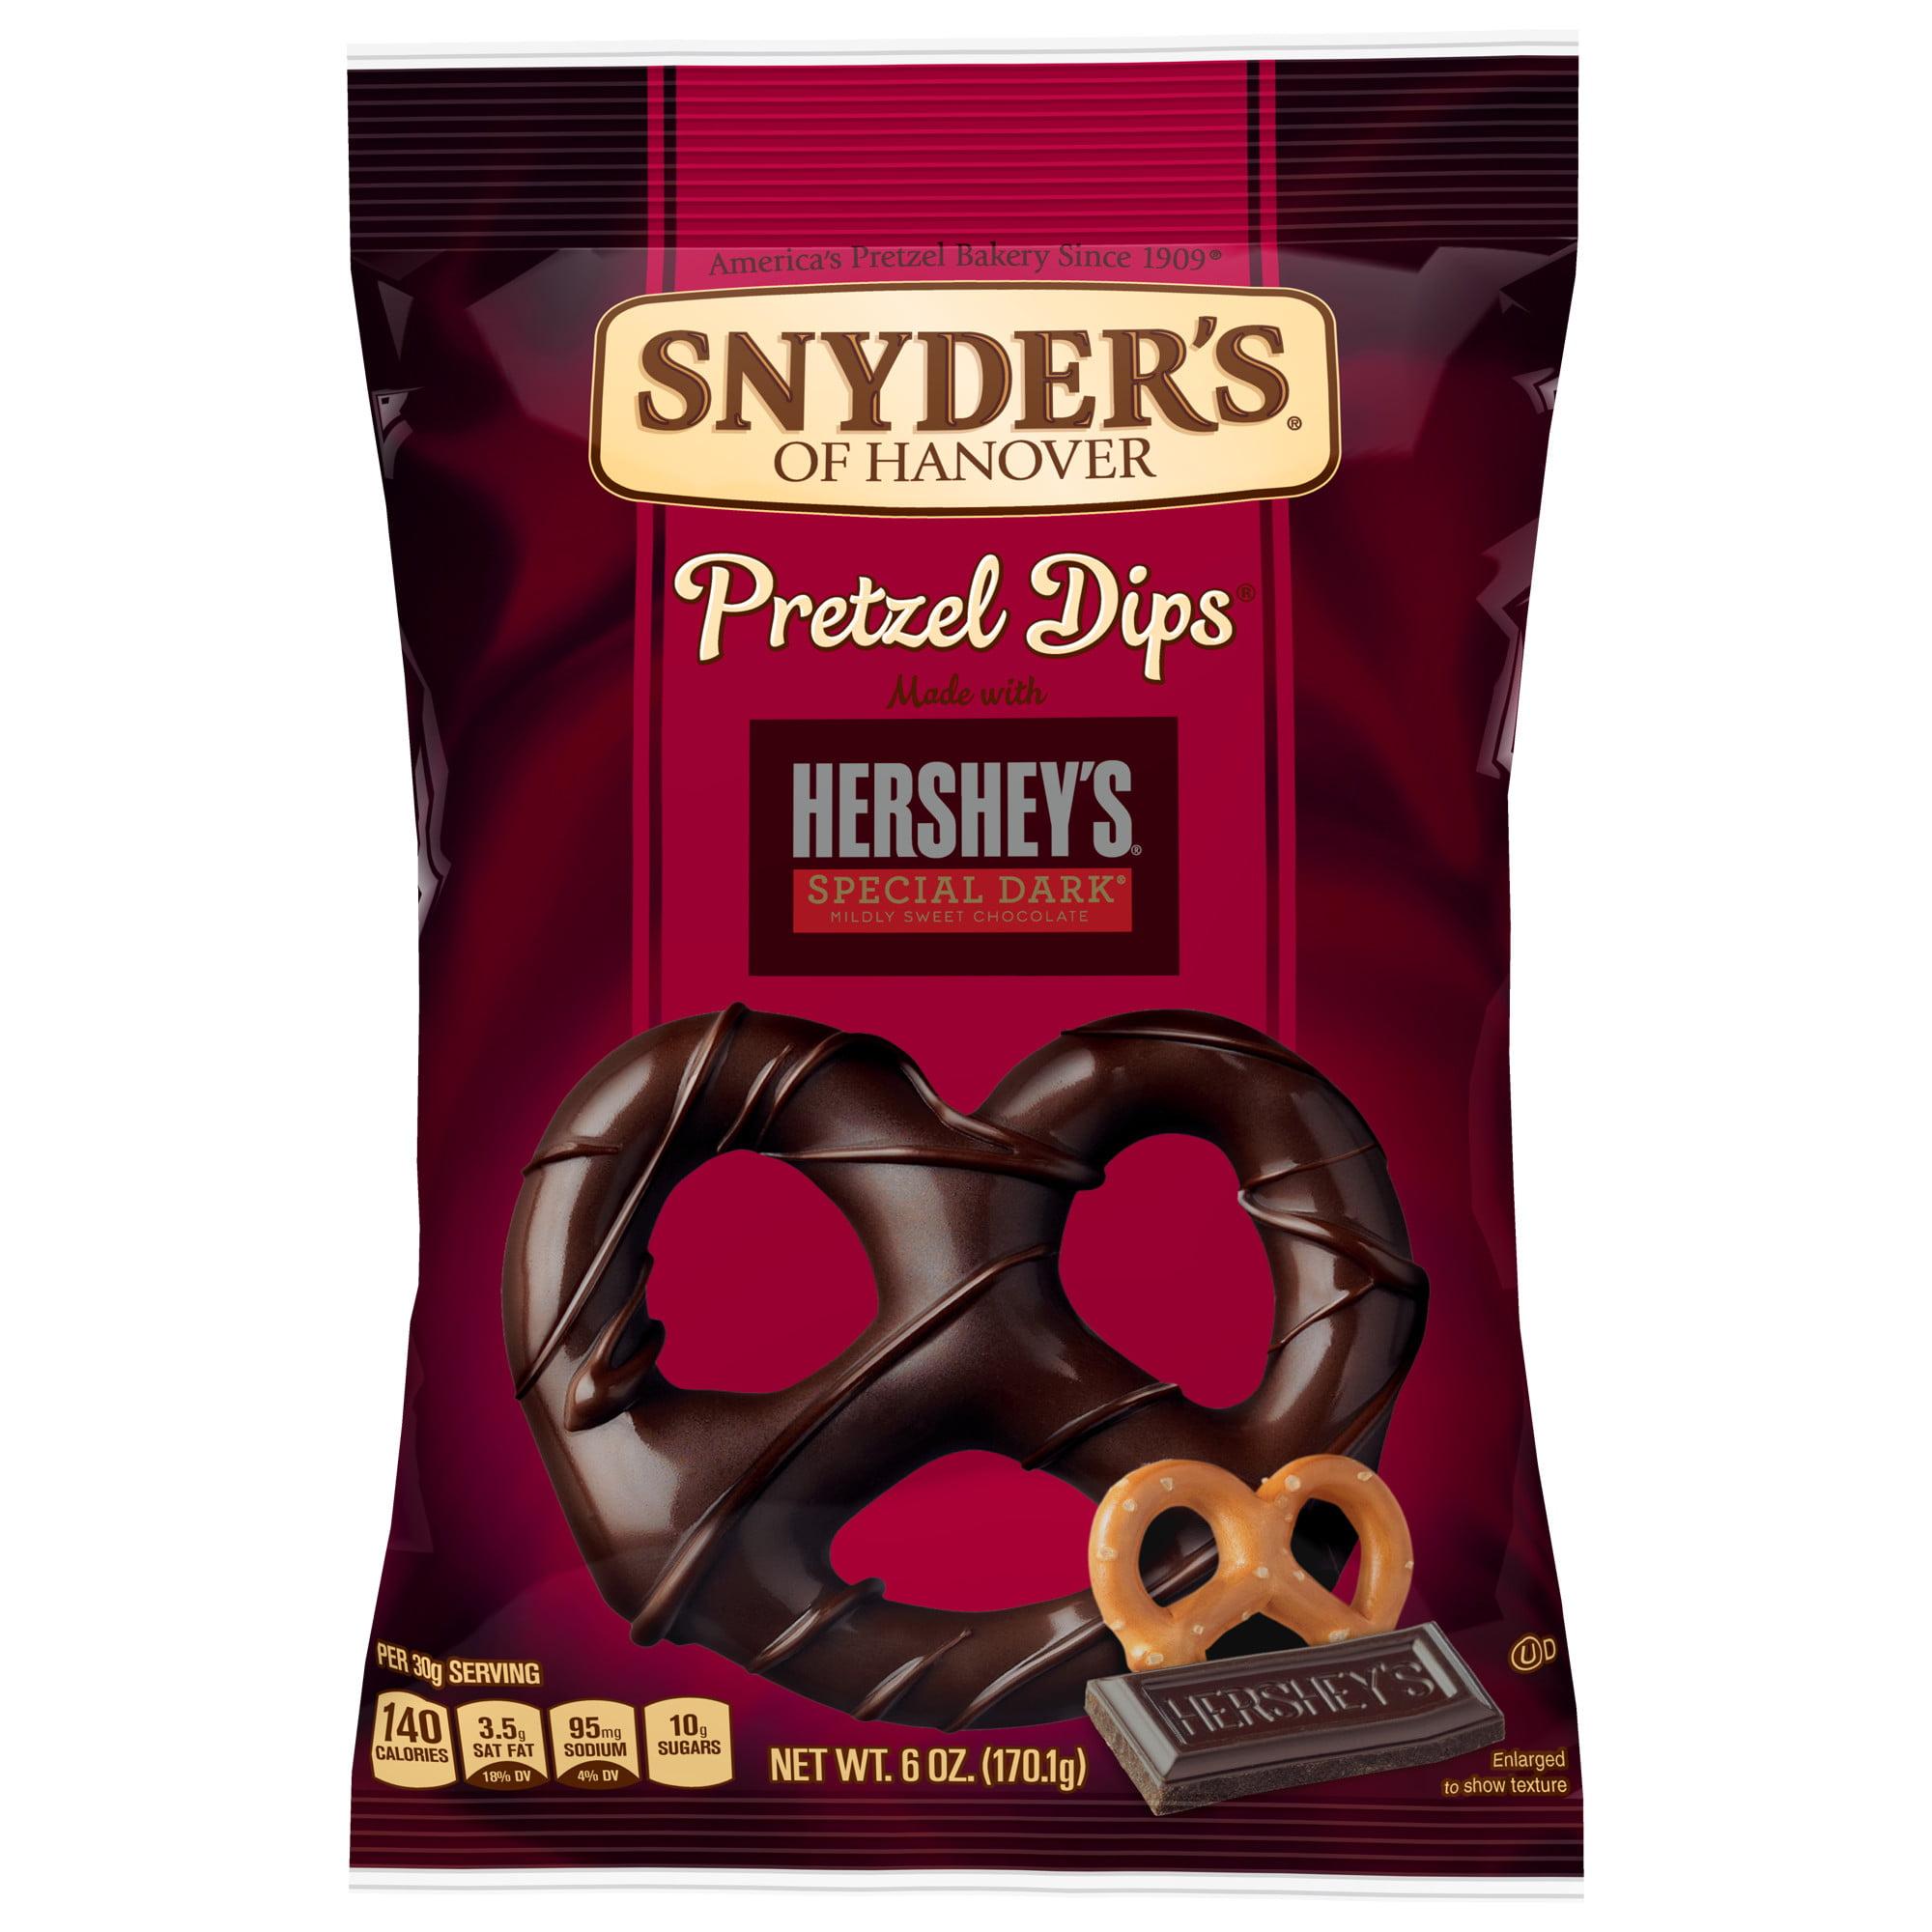 (2 Pack) Snyder's of Hanover Hershey's Pretzel Dips, Special Dark Chocolate, 6 Oz